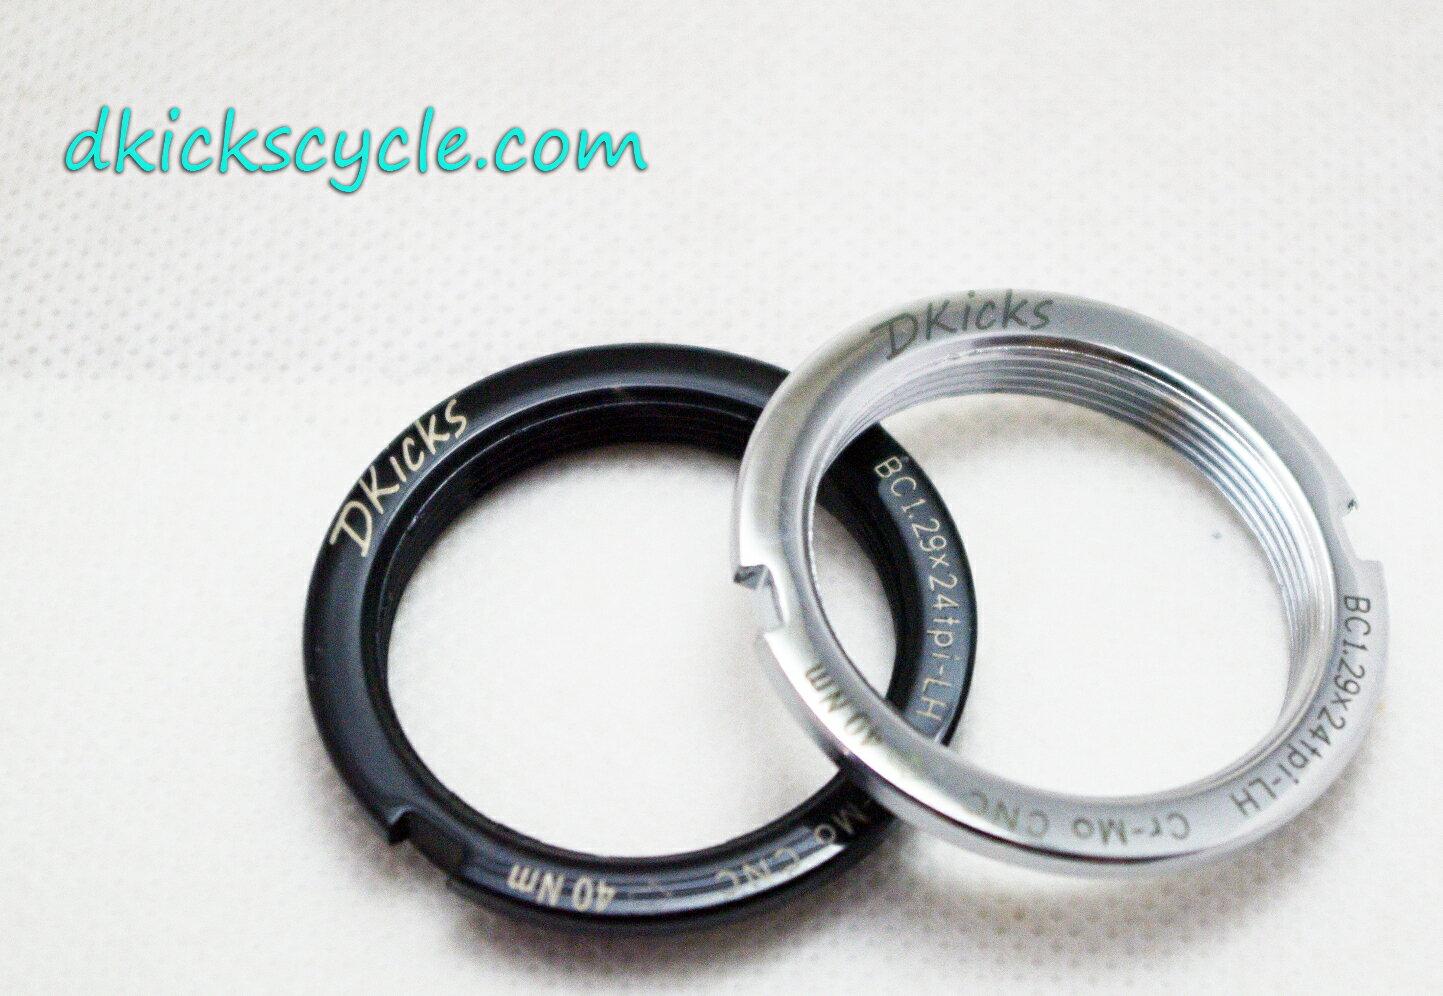 Dkicks cycle Fixed gear 花鼓鎖緊環 Lock ring 黑色或銀色 單速車 城市車